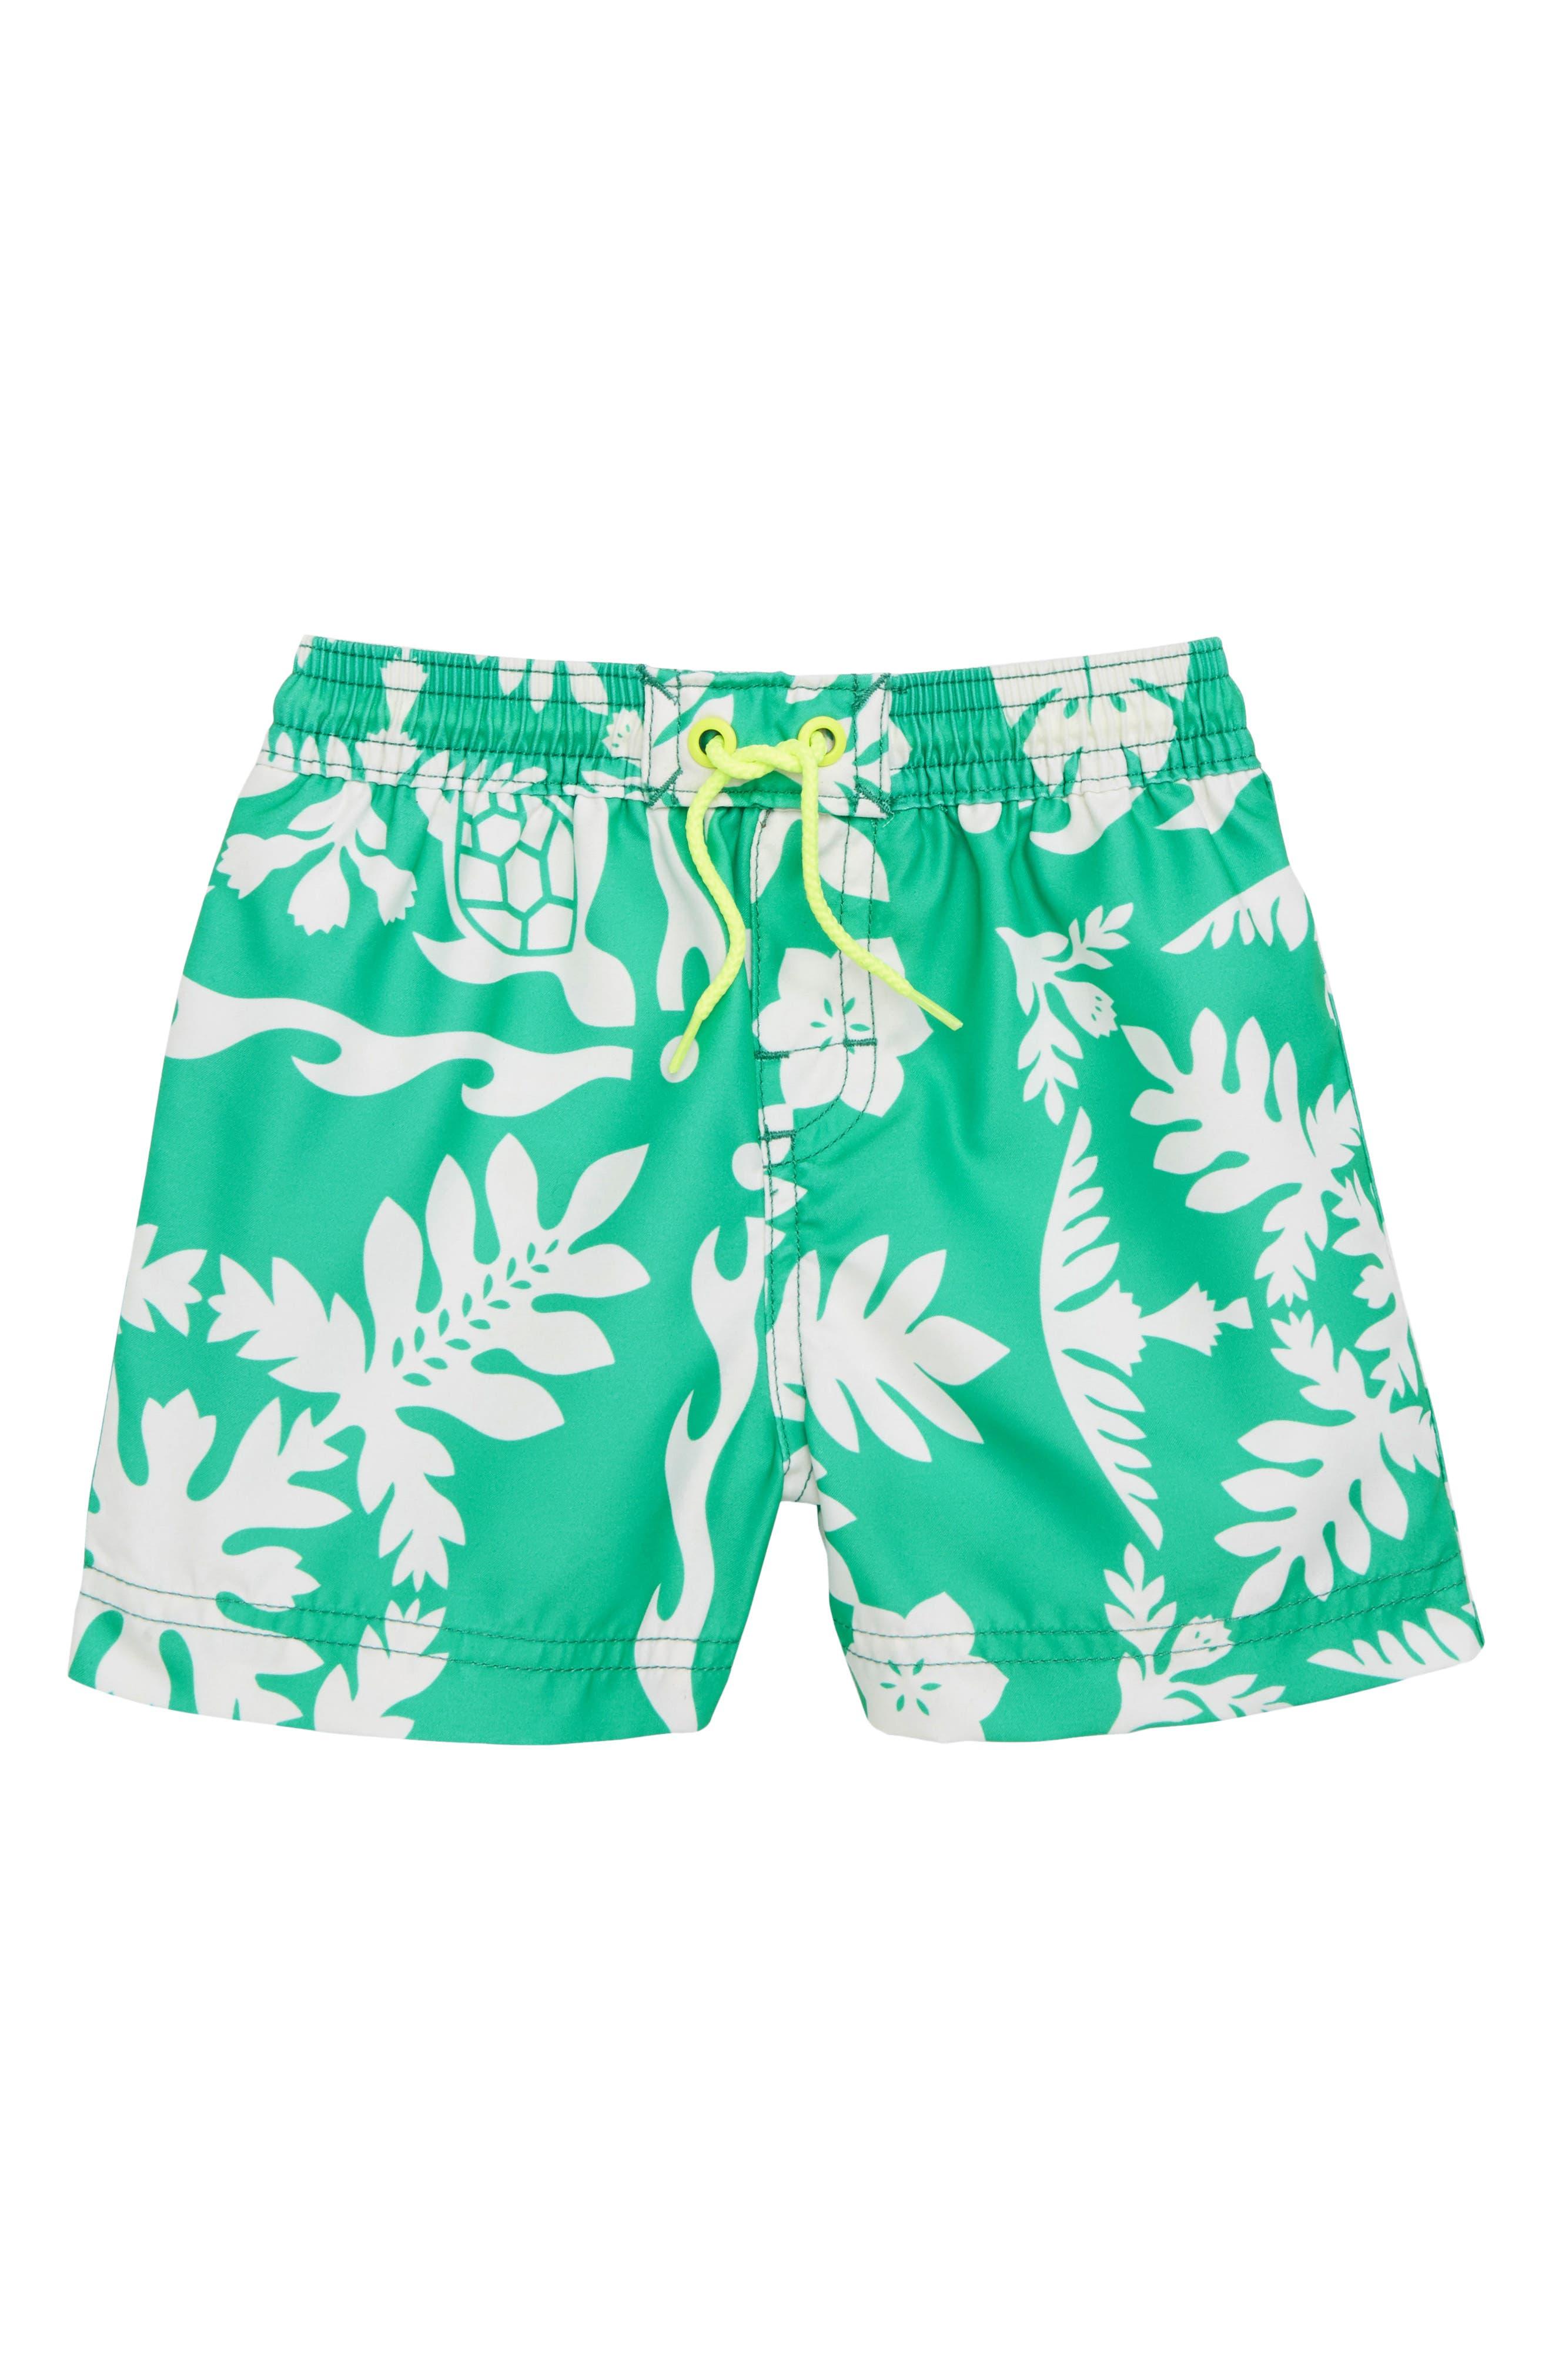 Print Swim Trunks,                             Main thumbnail 1, color,                             Green Pop Hawaiian Quilt